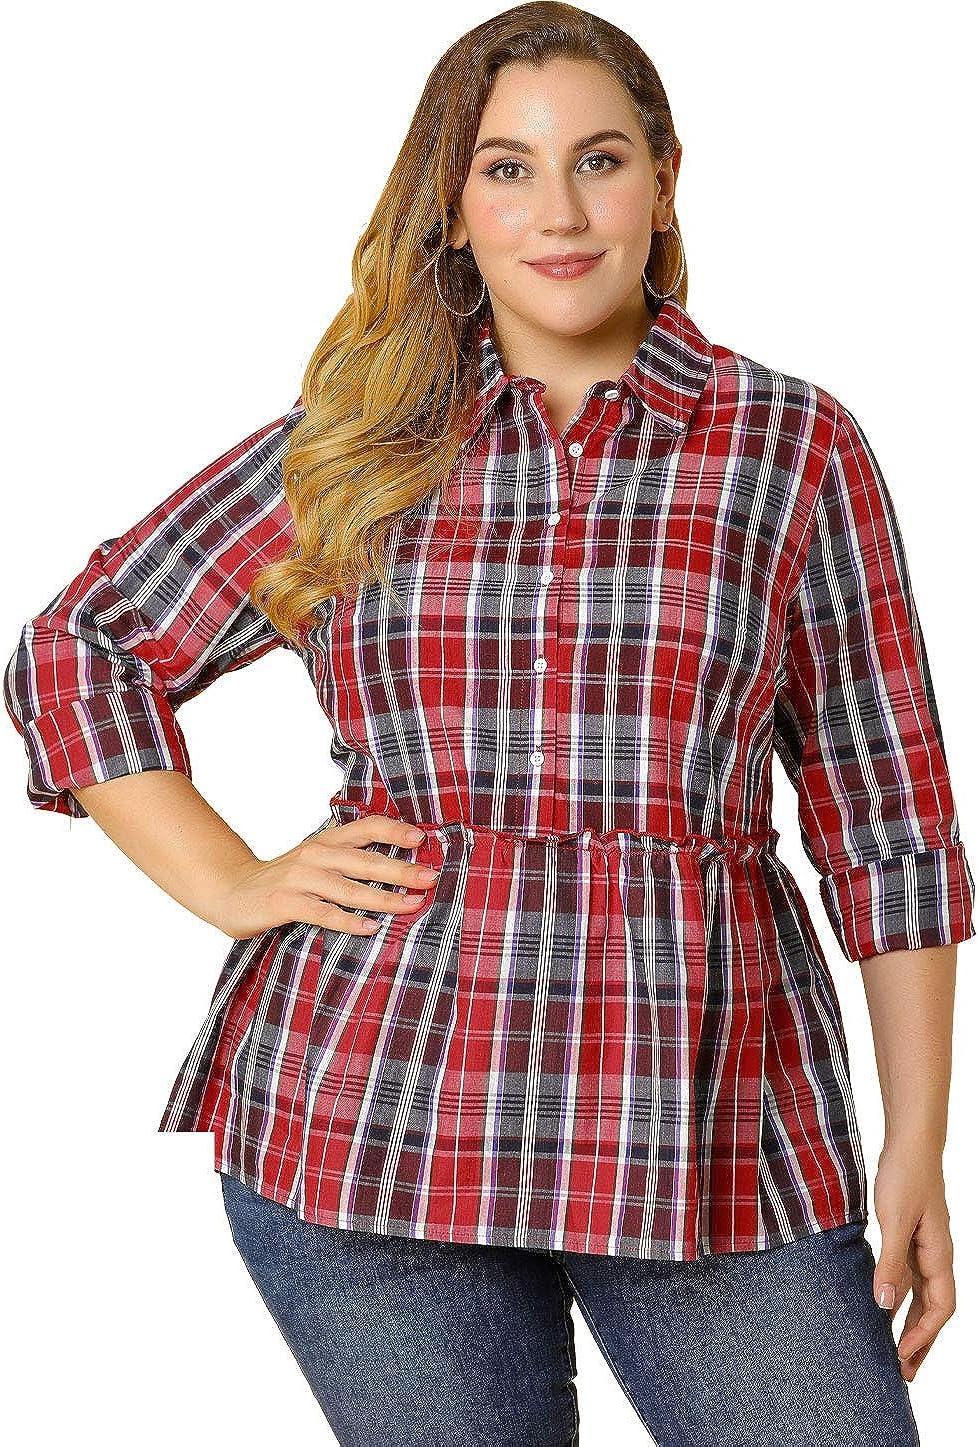 Agnes Orinda Women's Plus Size T Shirt Long Sleeve Button Down Plaid Peplum Work T Shirts